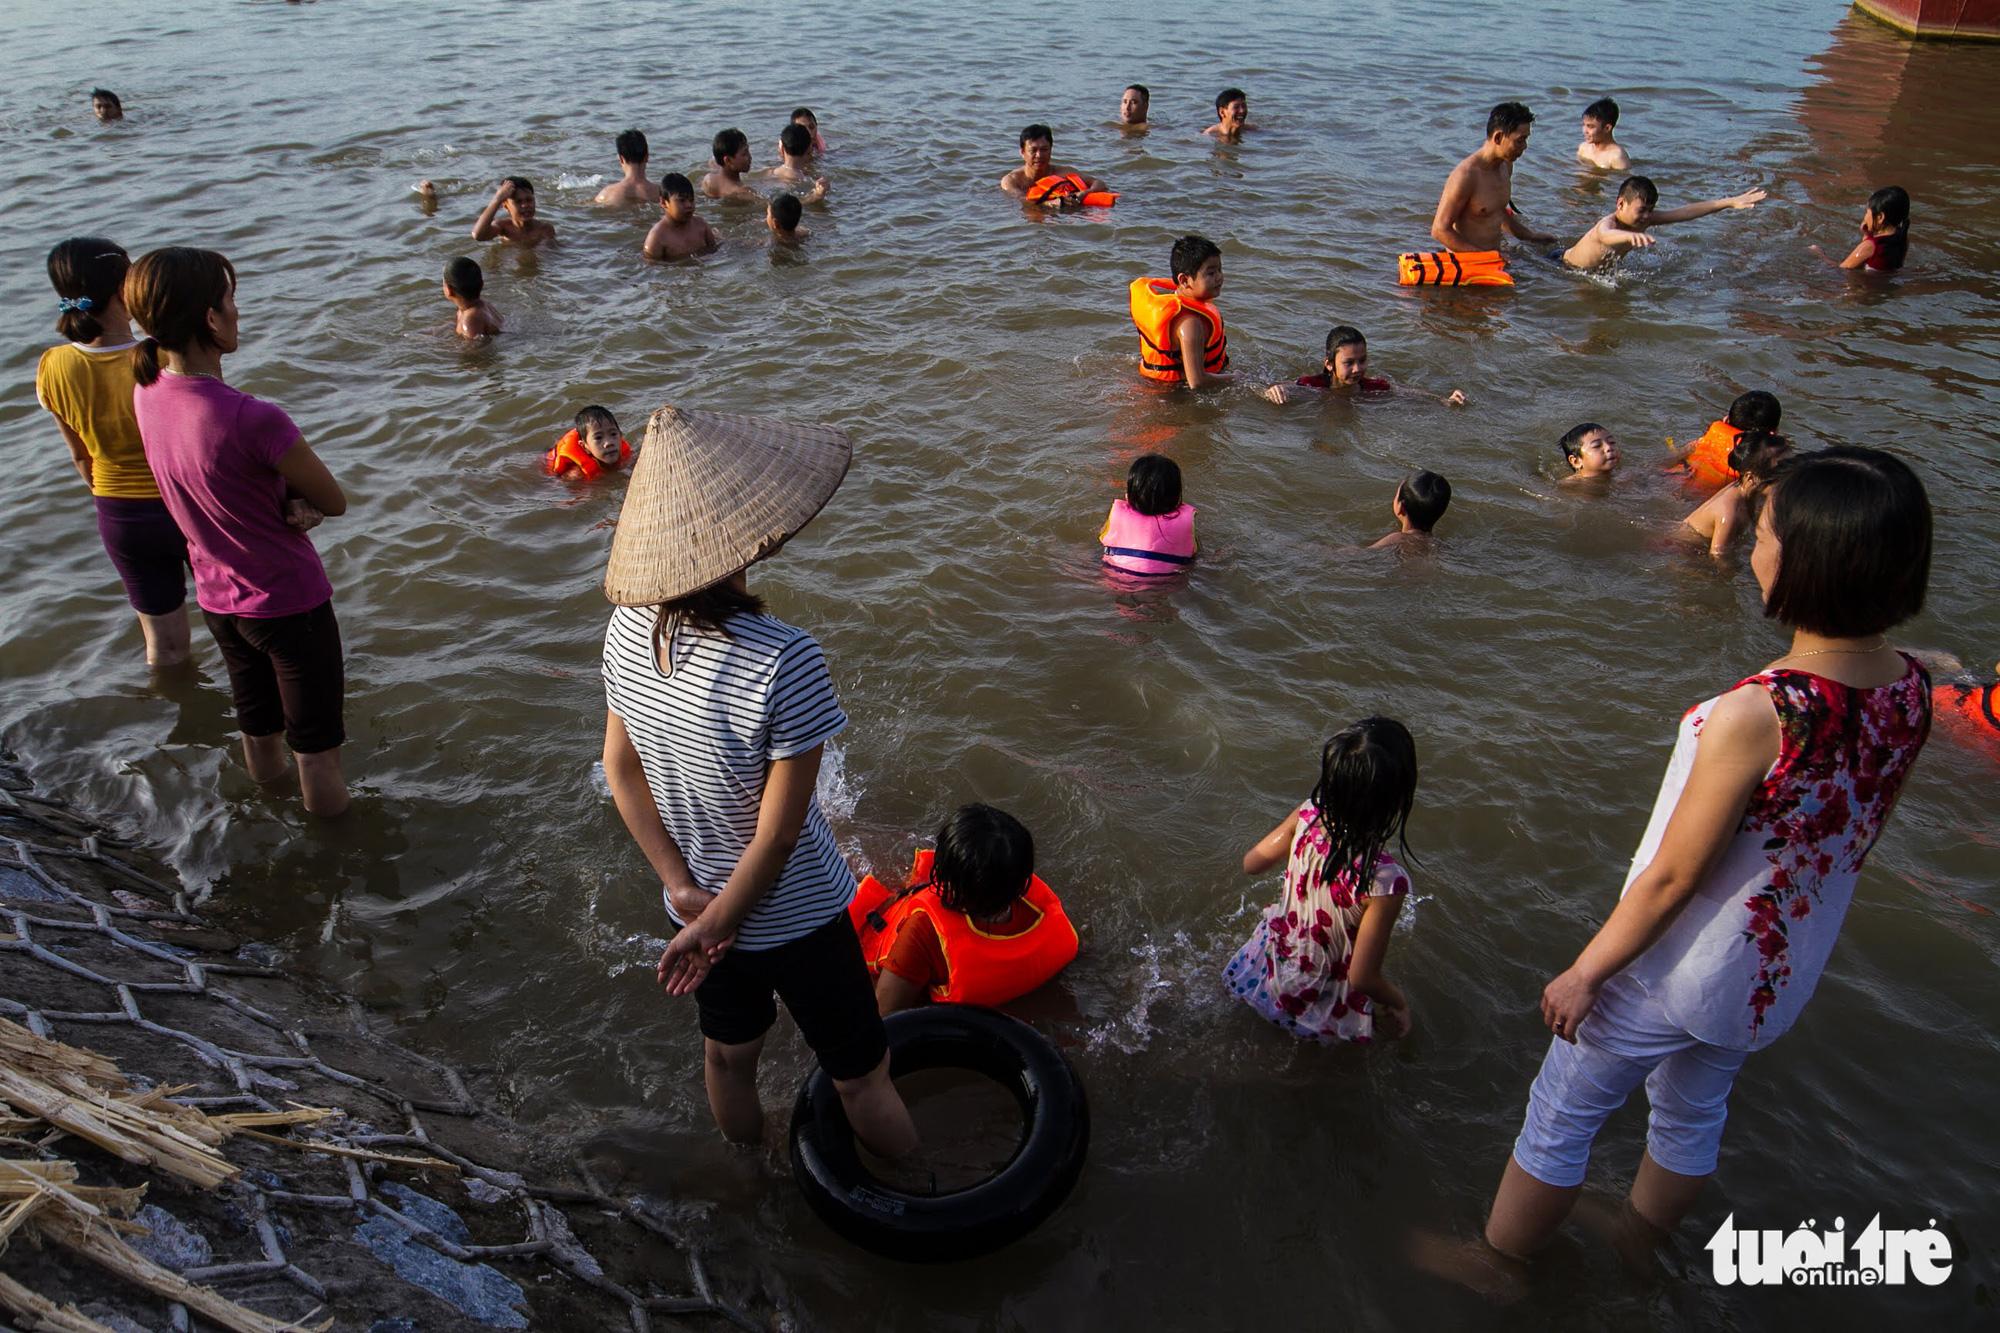 Over five children drown in Vietnam each day: ministry statistics